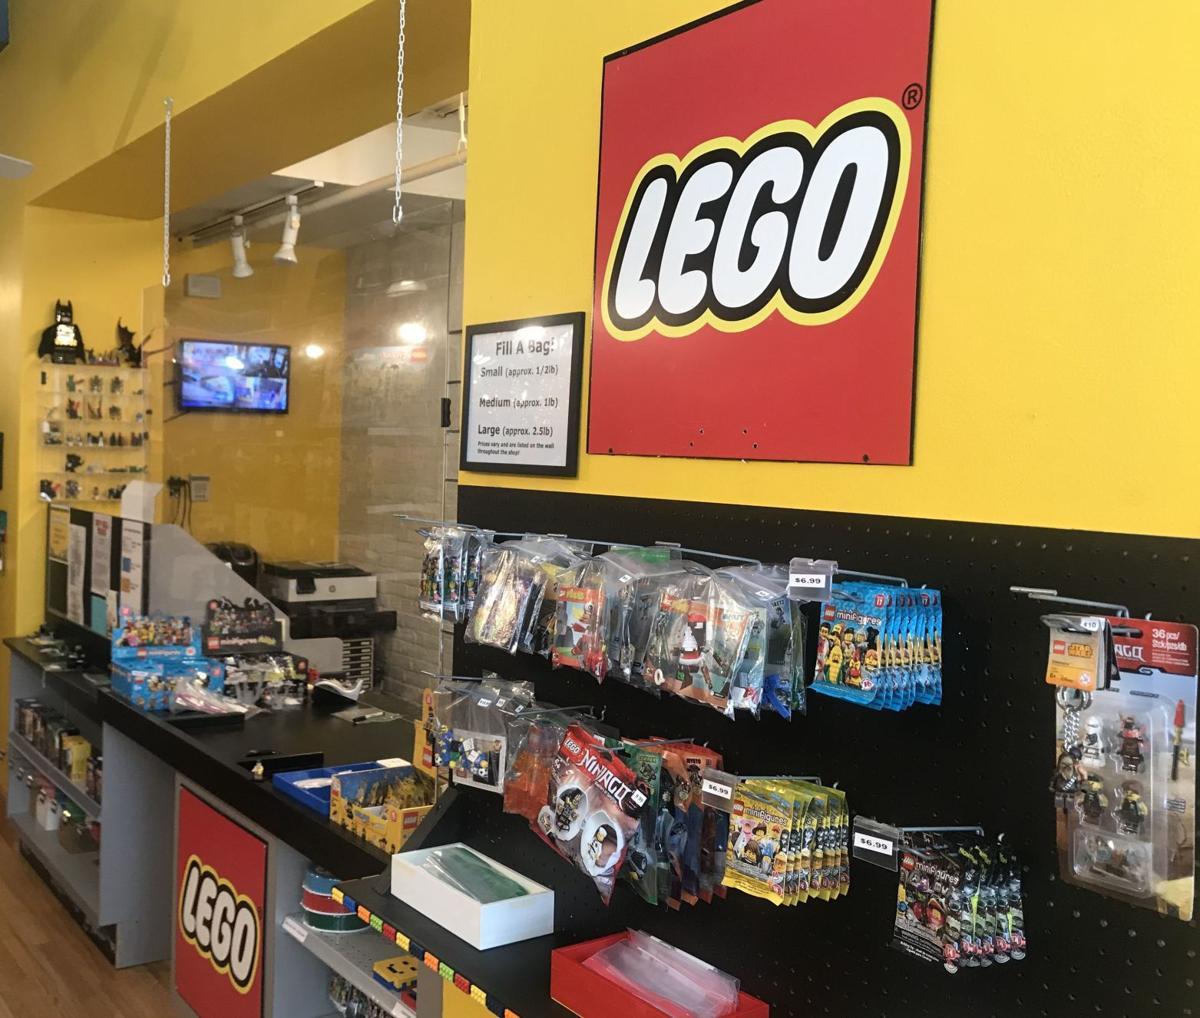 Legostorecroppe.jpg